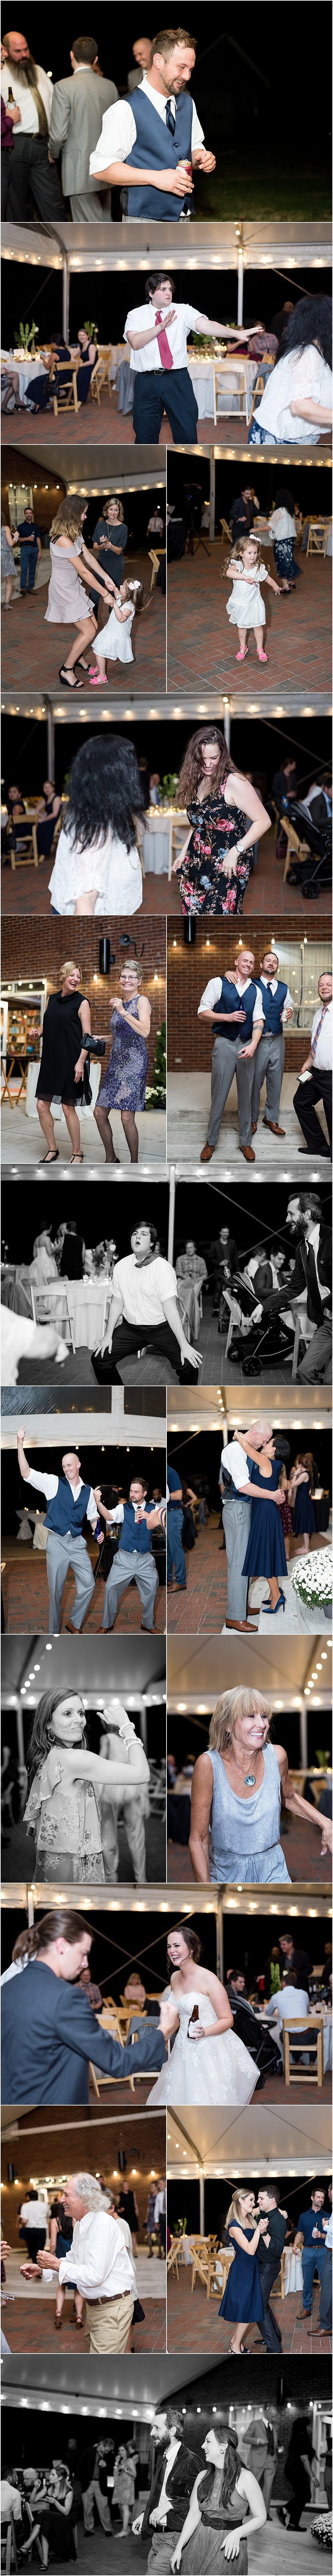 Nolan-And-Leanna-Vanderbilt-Dyer-Observatory-Wedding-in-Brentwood-TN-Nashville-Wedding-Photographers+11